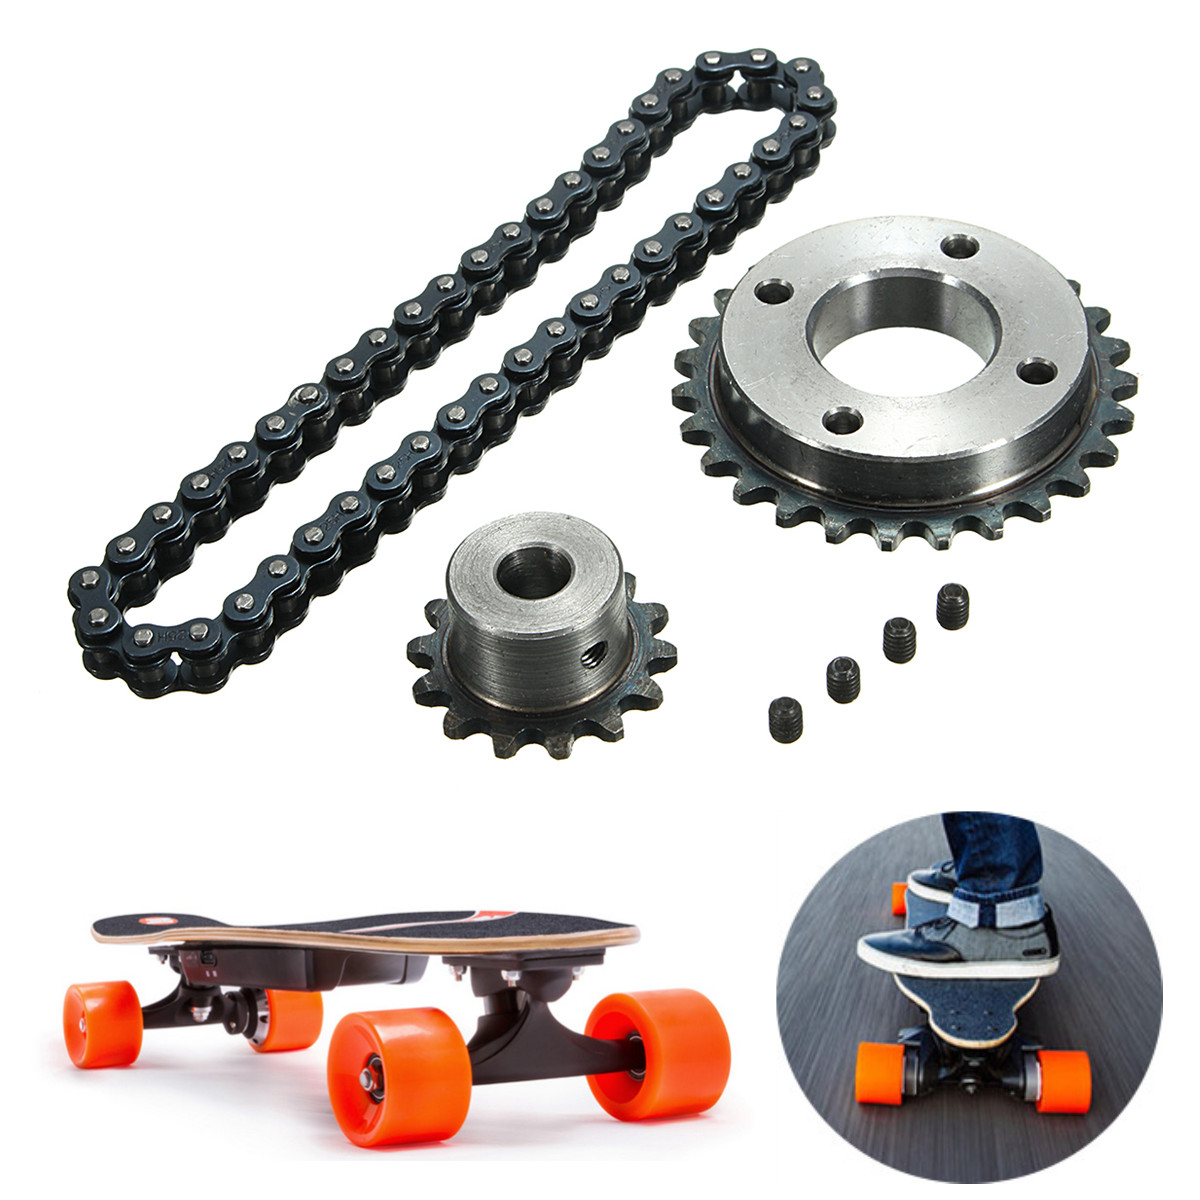 DIY Sprocket Chain Wheel For Electric Longboard 8044 Skateboard Repalcement Part Skateboard Accessories